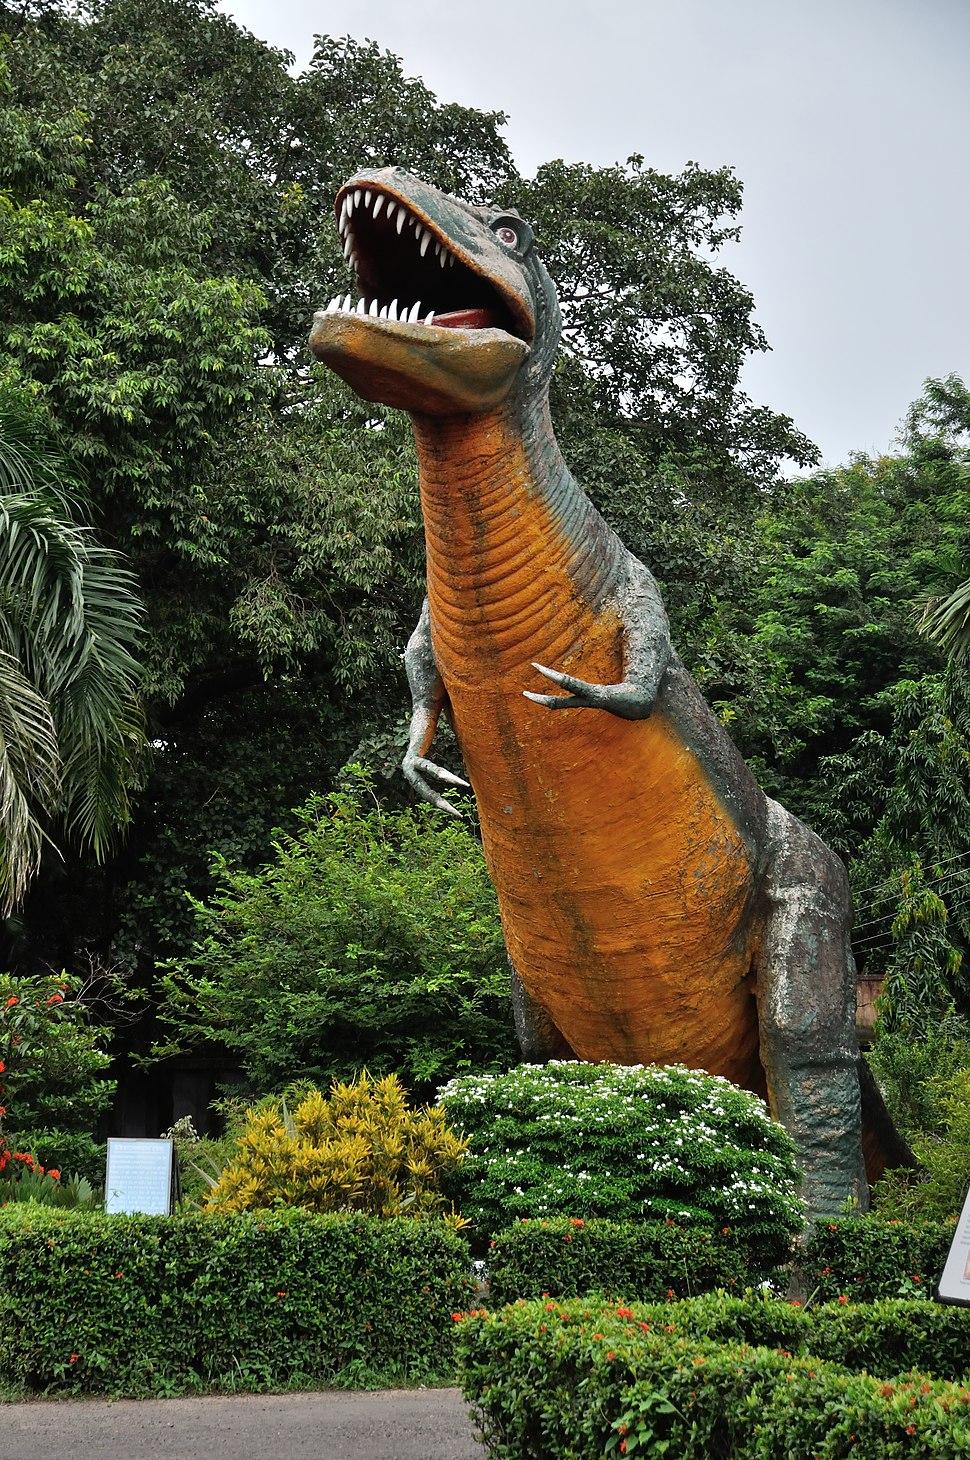 Tyrannosaurus rex - Fibreglass Statue - Bardhaman Science Centre - Bardhaman 2015-07-24 1528